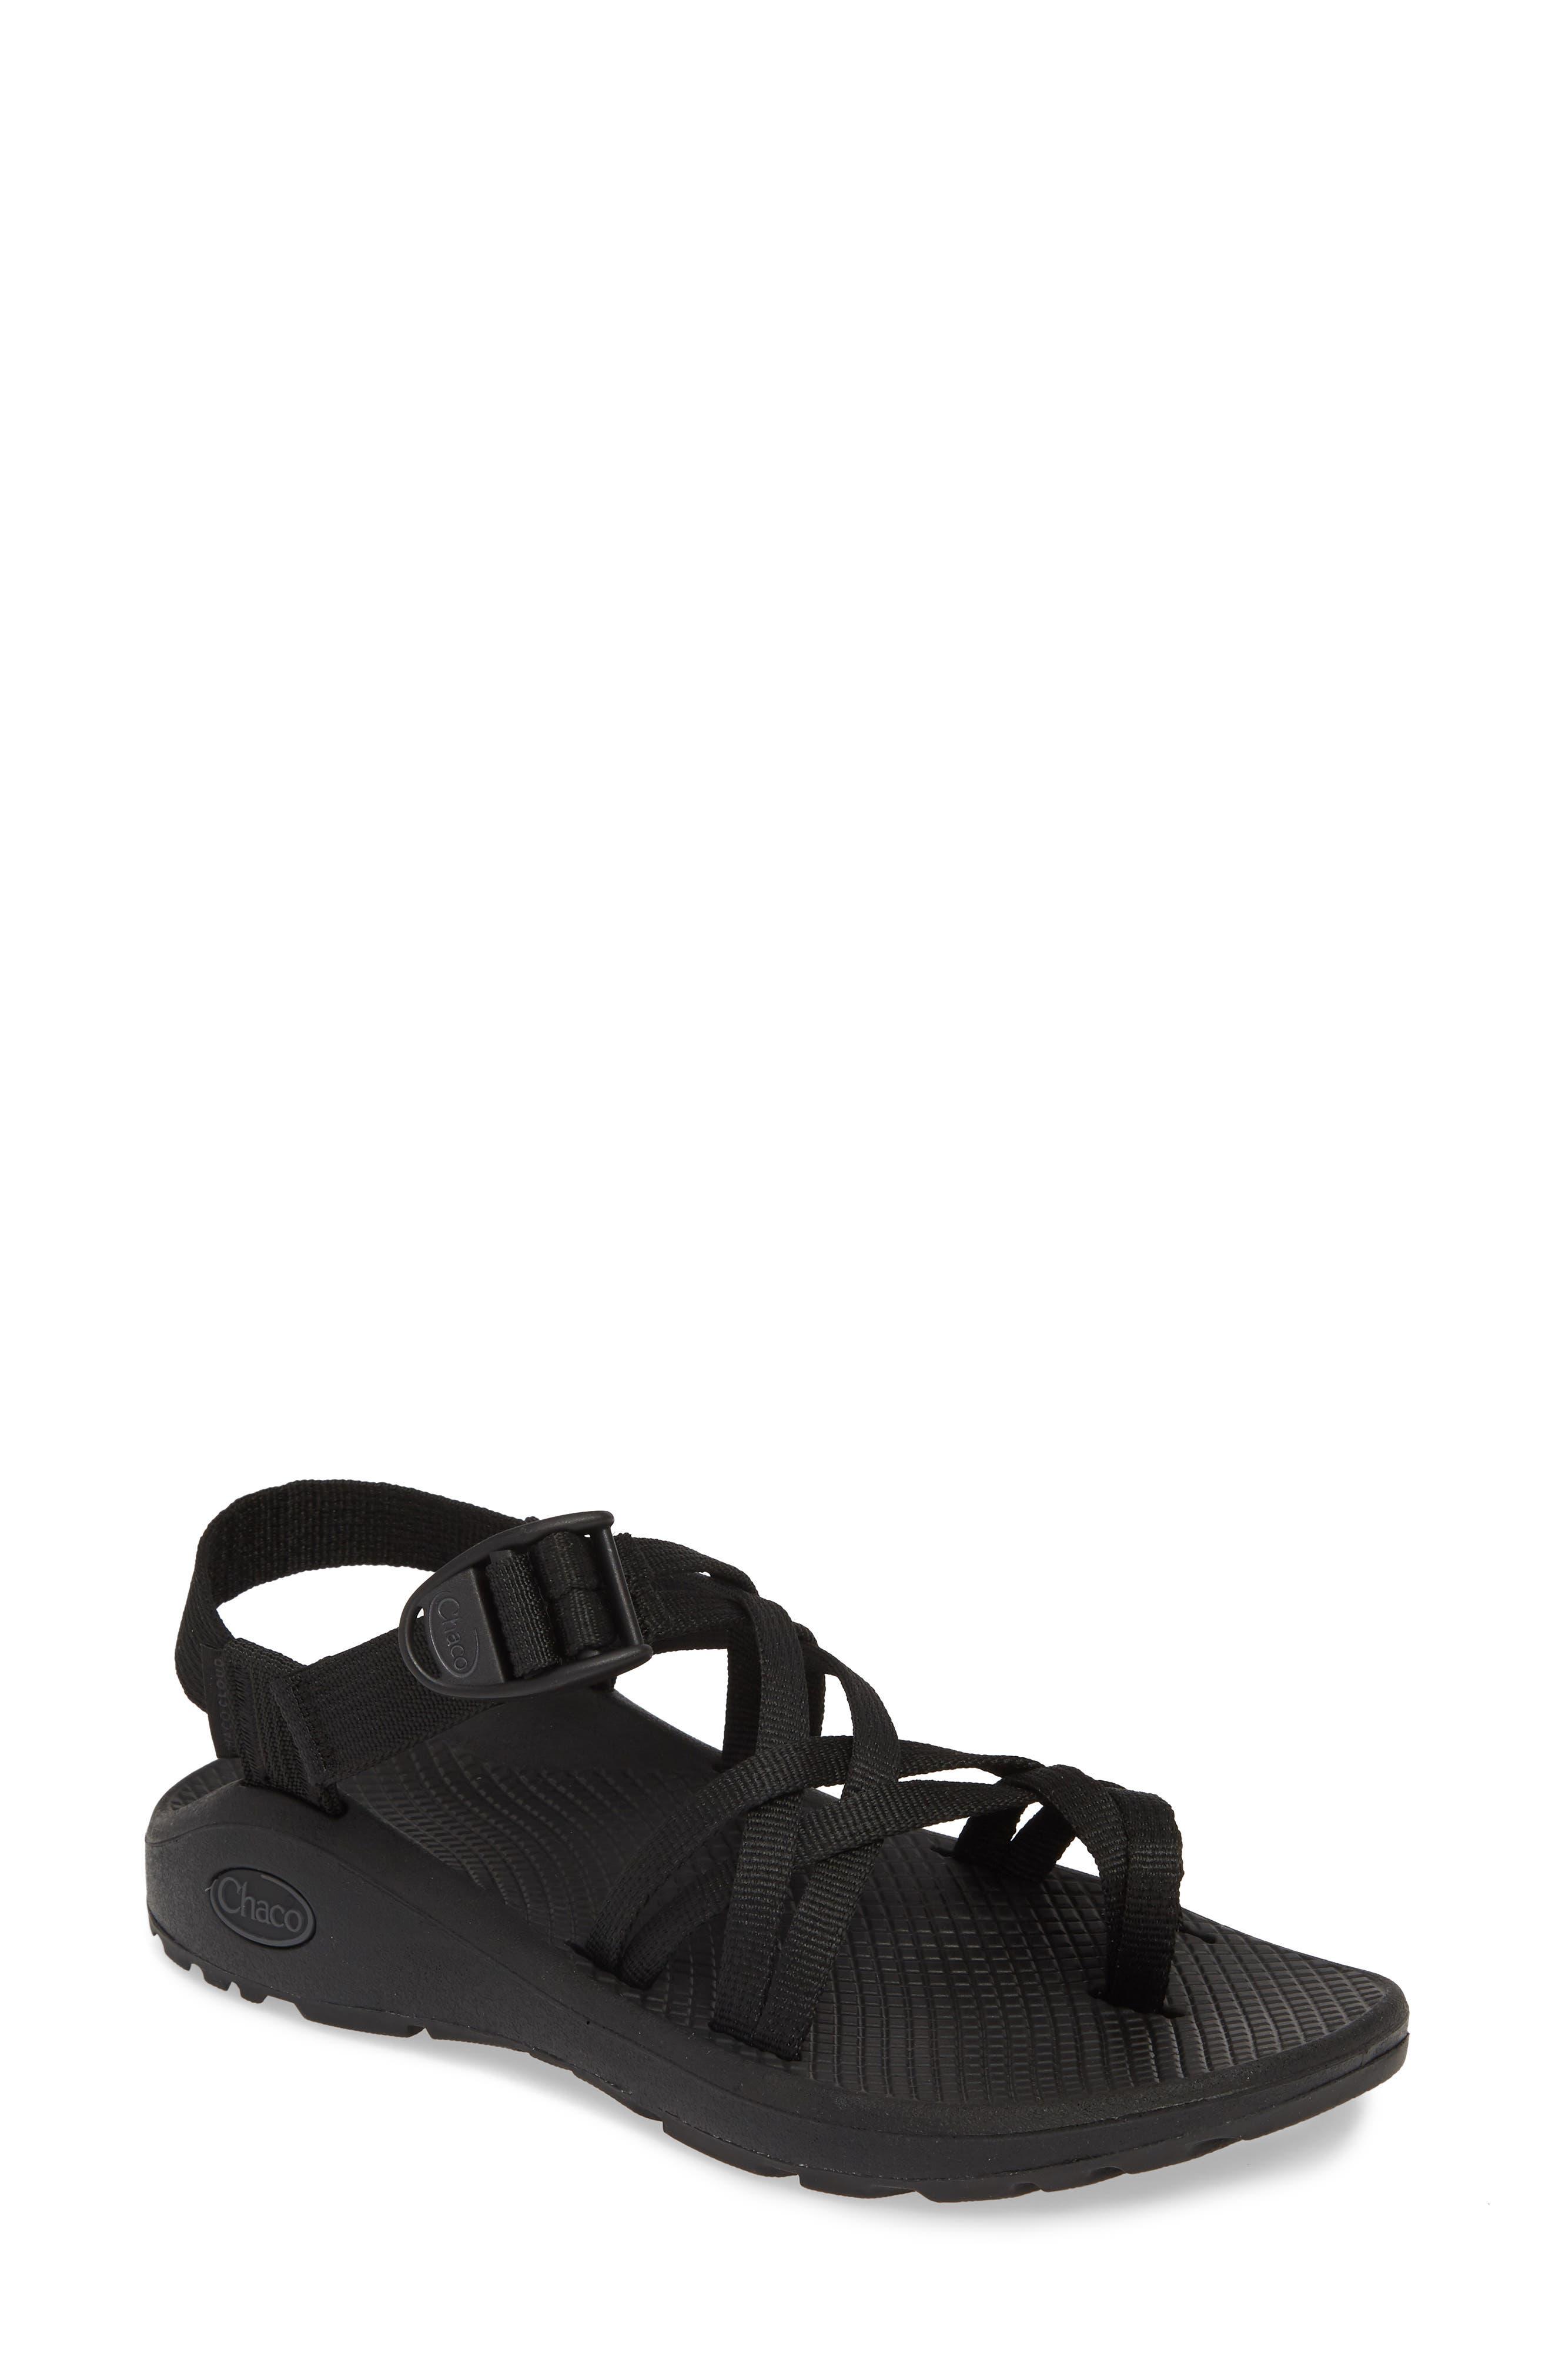 CHACO,                             Z/Cloud X2 Sandal,                             Main thumbnail 1, color,                             SOLID BLACK FABRIC